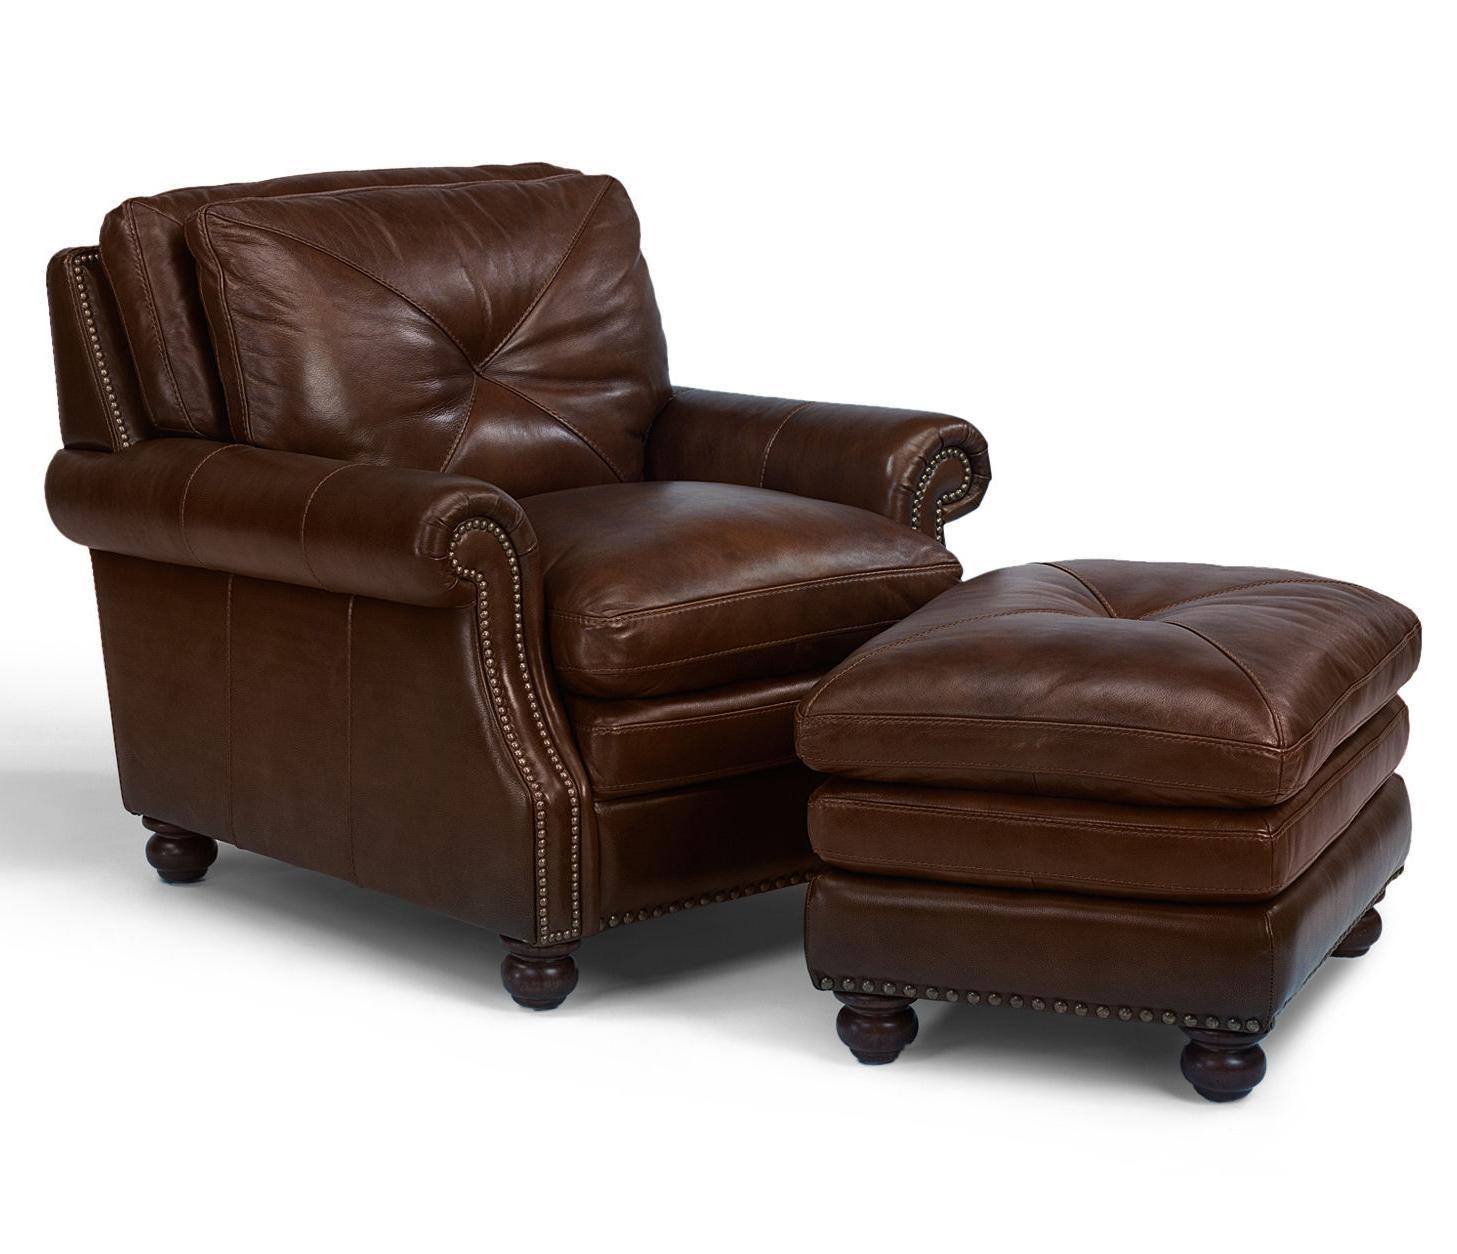 Flexsteel Latitudes Suffolk Leather Chair And Ottoman